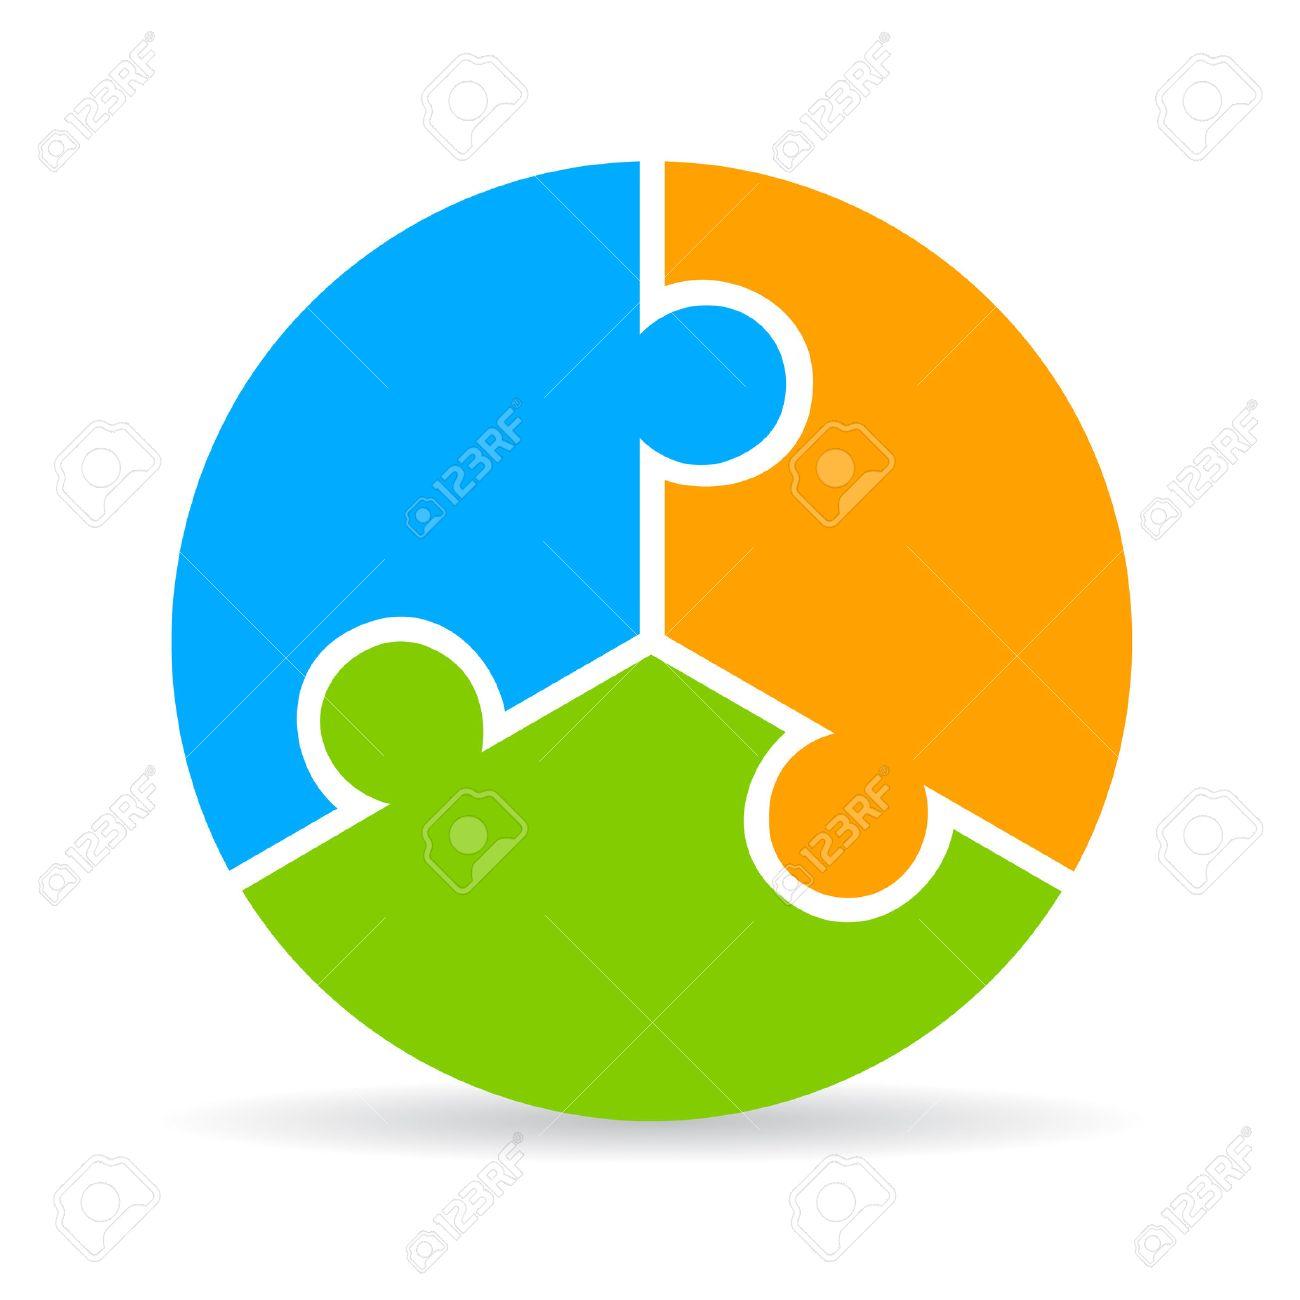 Three part puzzle process diagram - 50934732